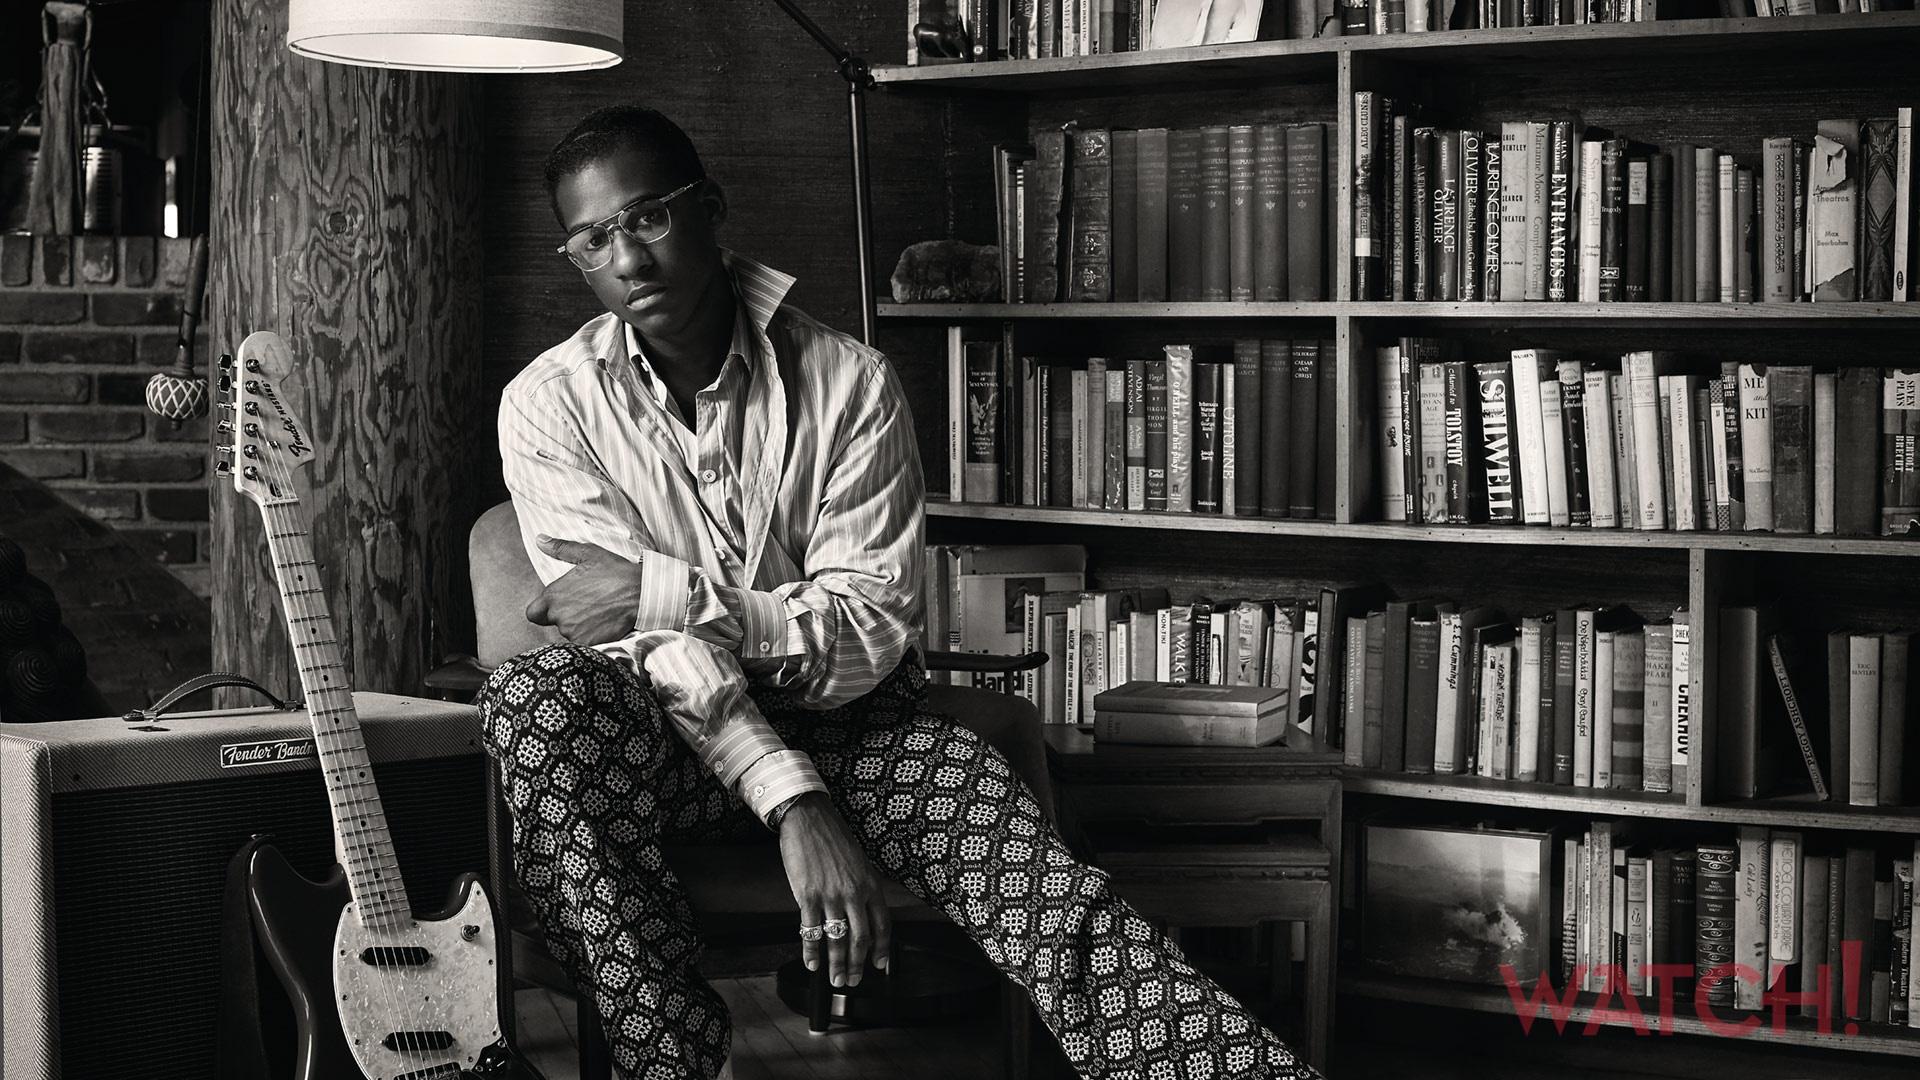 Leon Bridges brings the funk